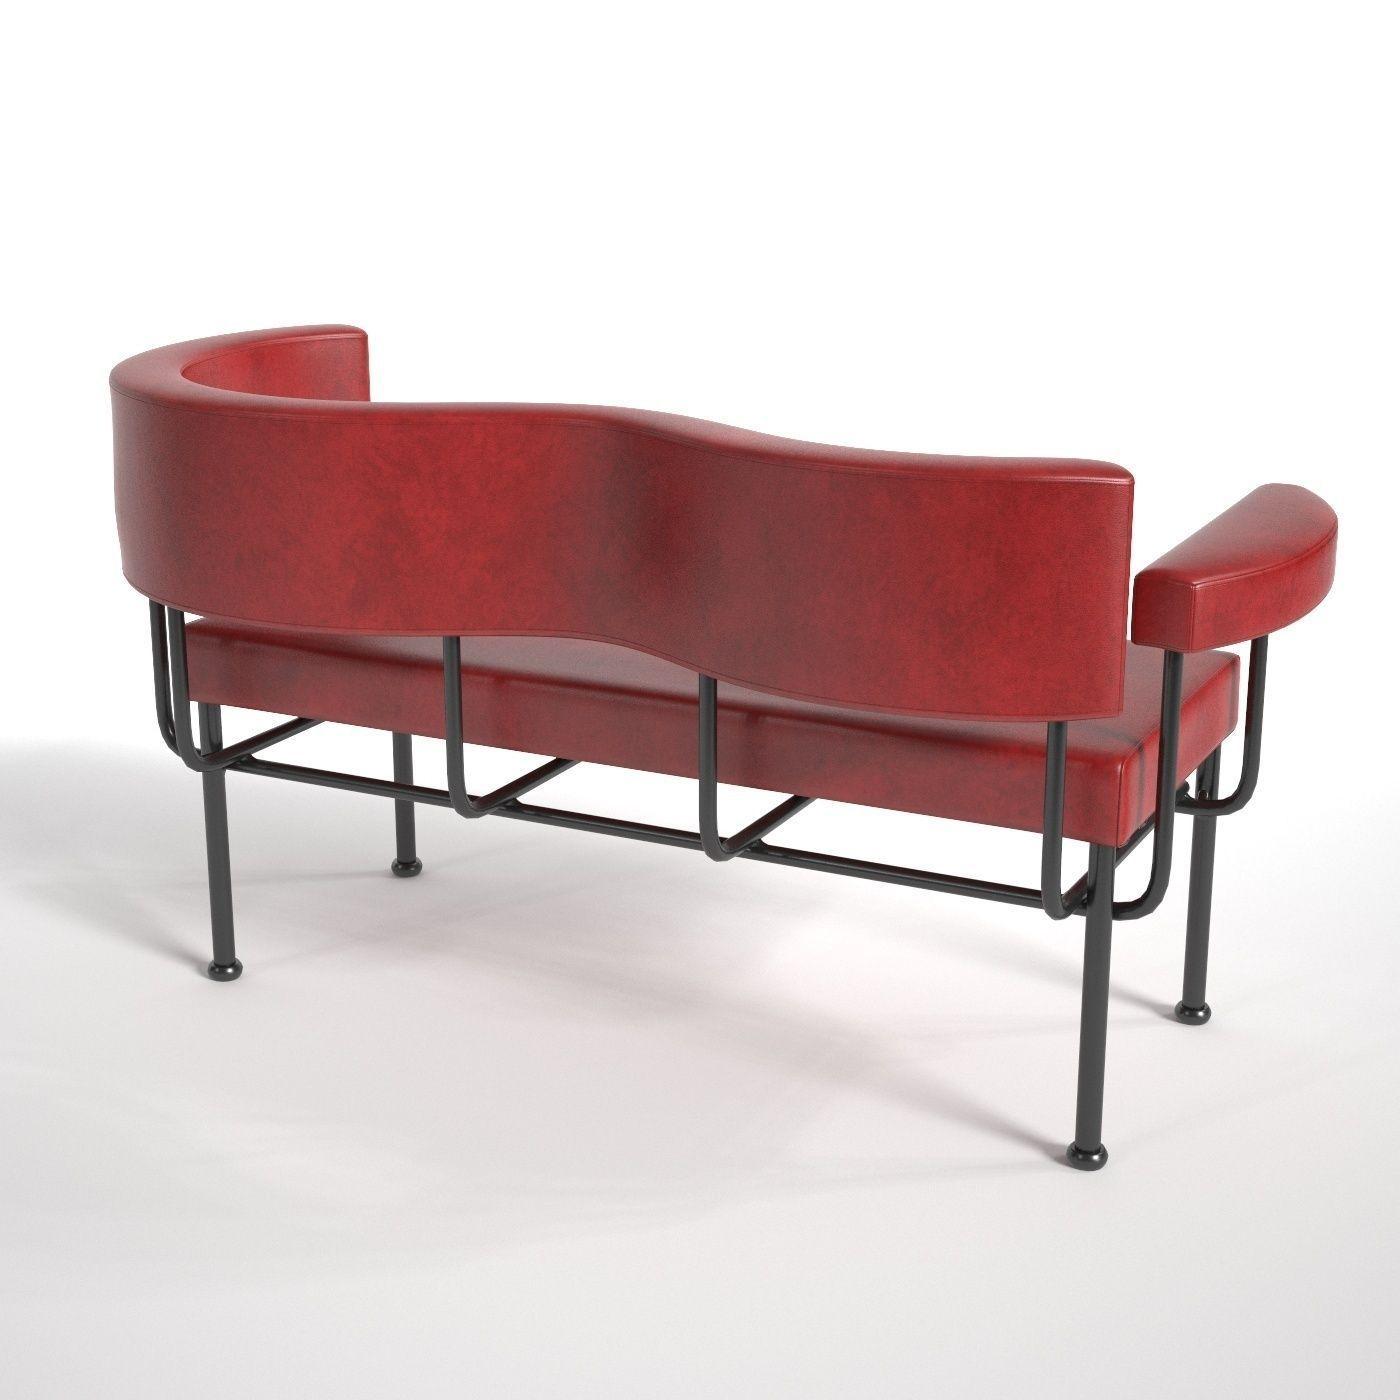 Stellar Works Cotton Club Sofa 3D